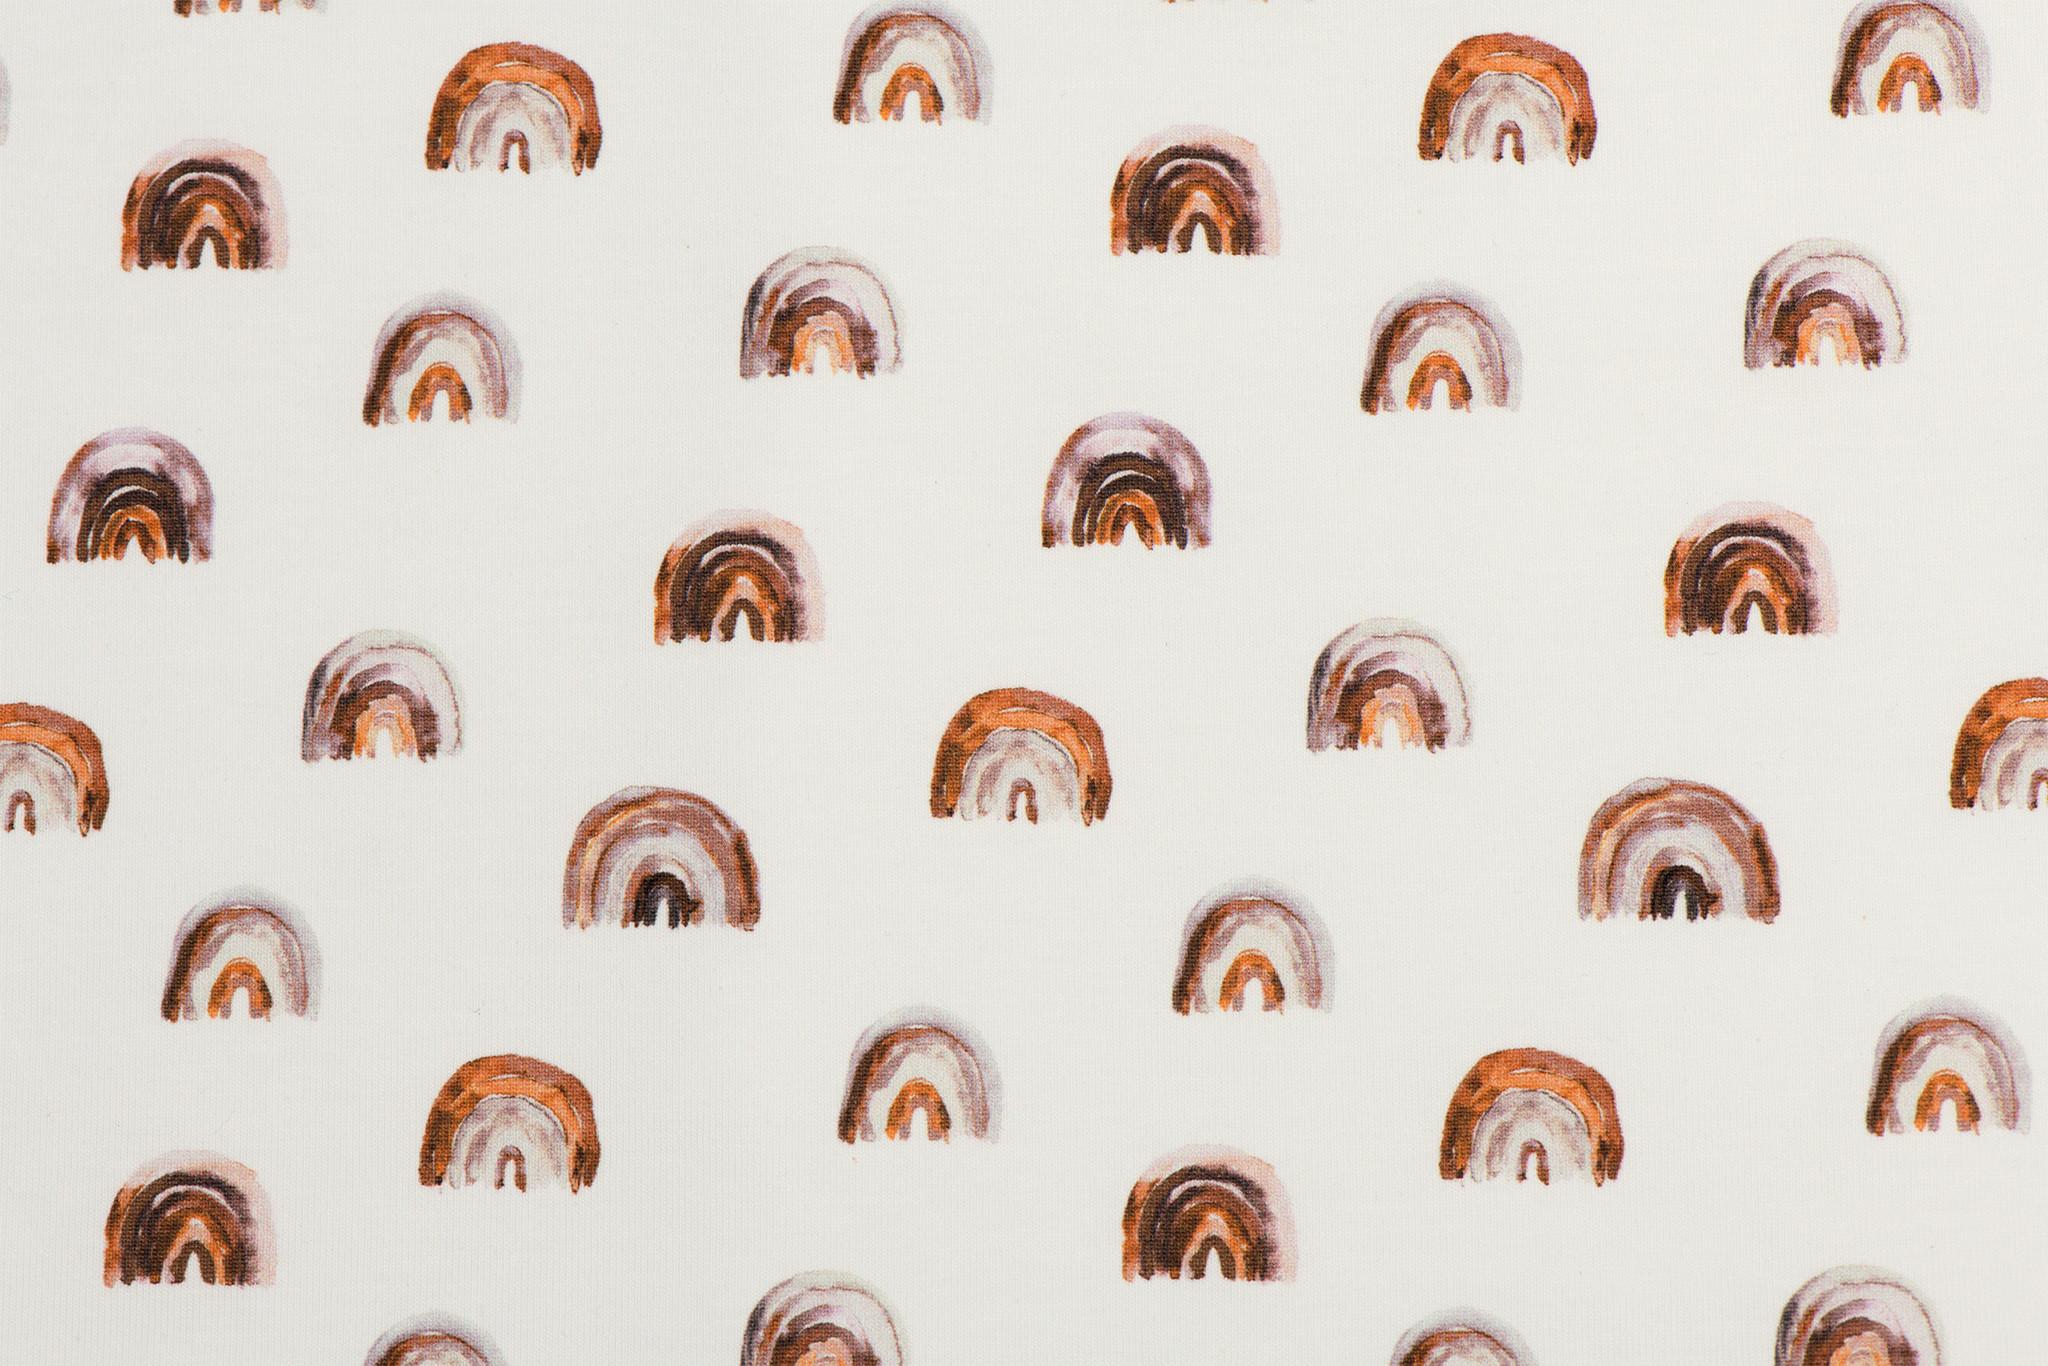 Poplin Katoen Digitale Print - Mini Regenboog Licht Bruin